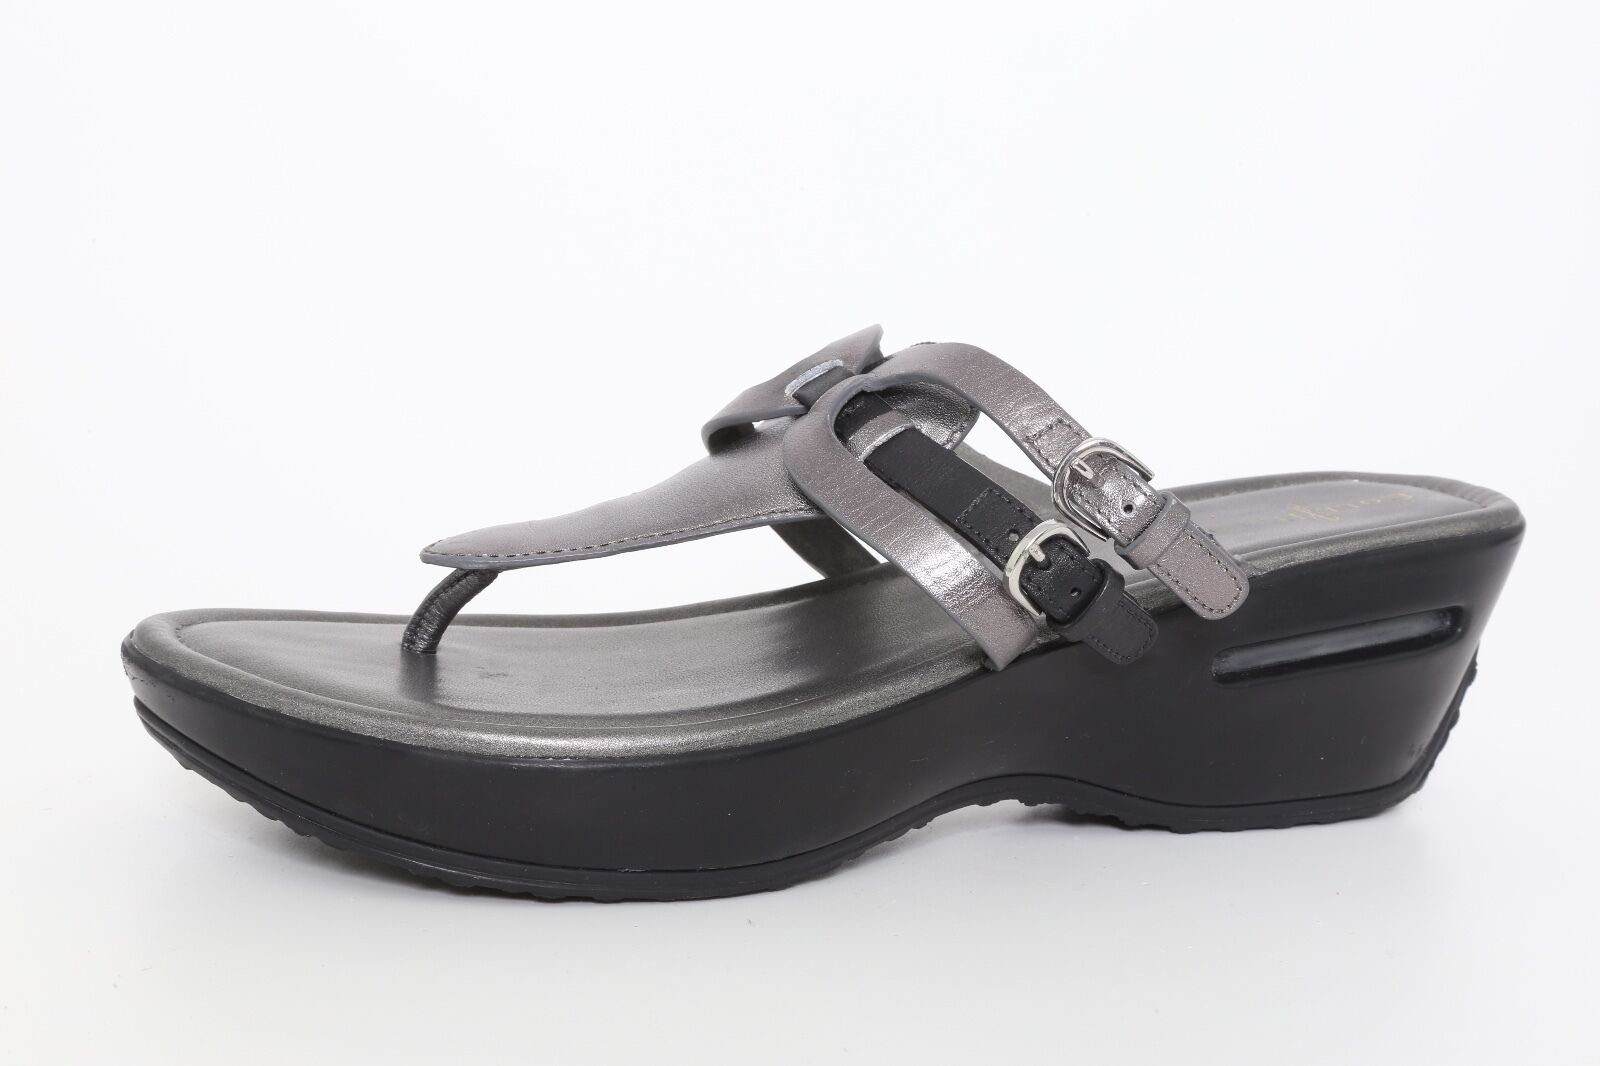 Cole Cole Cole Haan Women's Leather Air Melisa Thong Sandal Gunsmoke Metallic 4058 Sz 9.5B 46e992